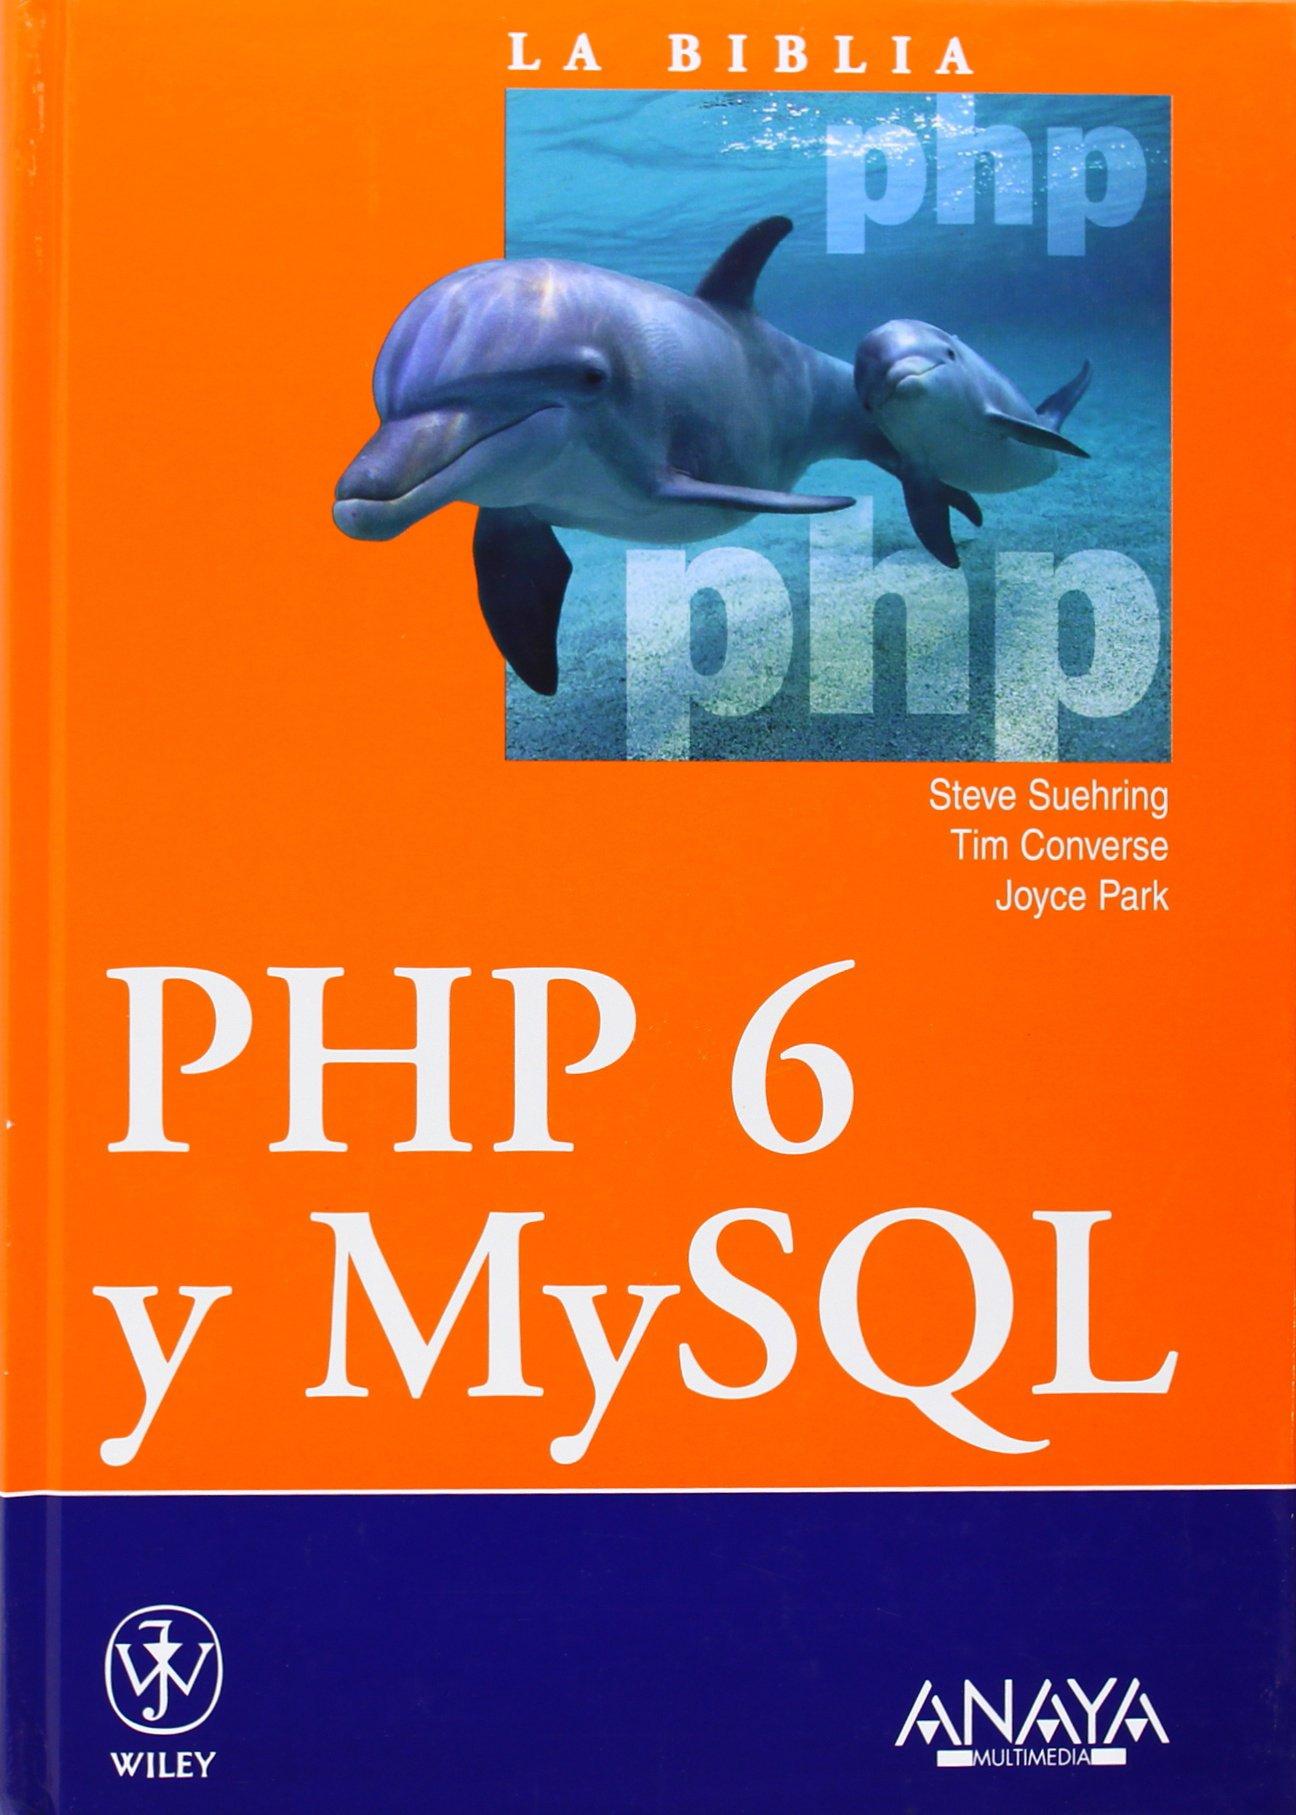 PHP 6 y MySQL (La Biblia De) Tapa dura – 7 sep 2009 Steve Suehring Tim Converse Joyce Park ANAYA MULTIMEDIA